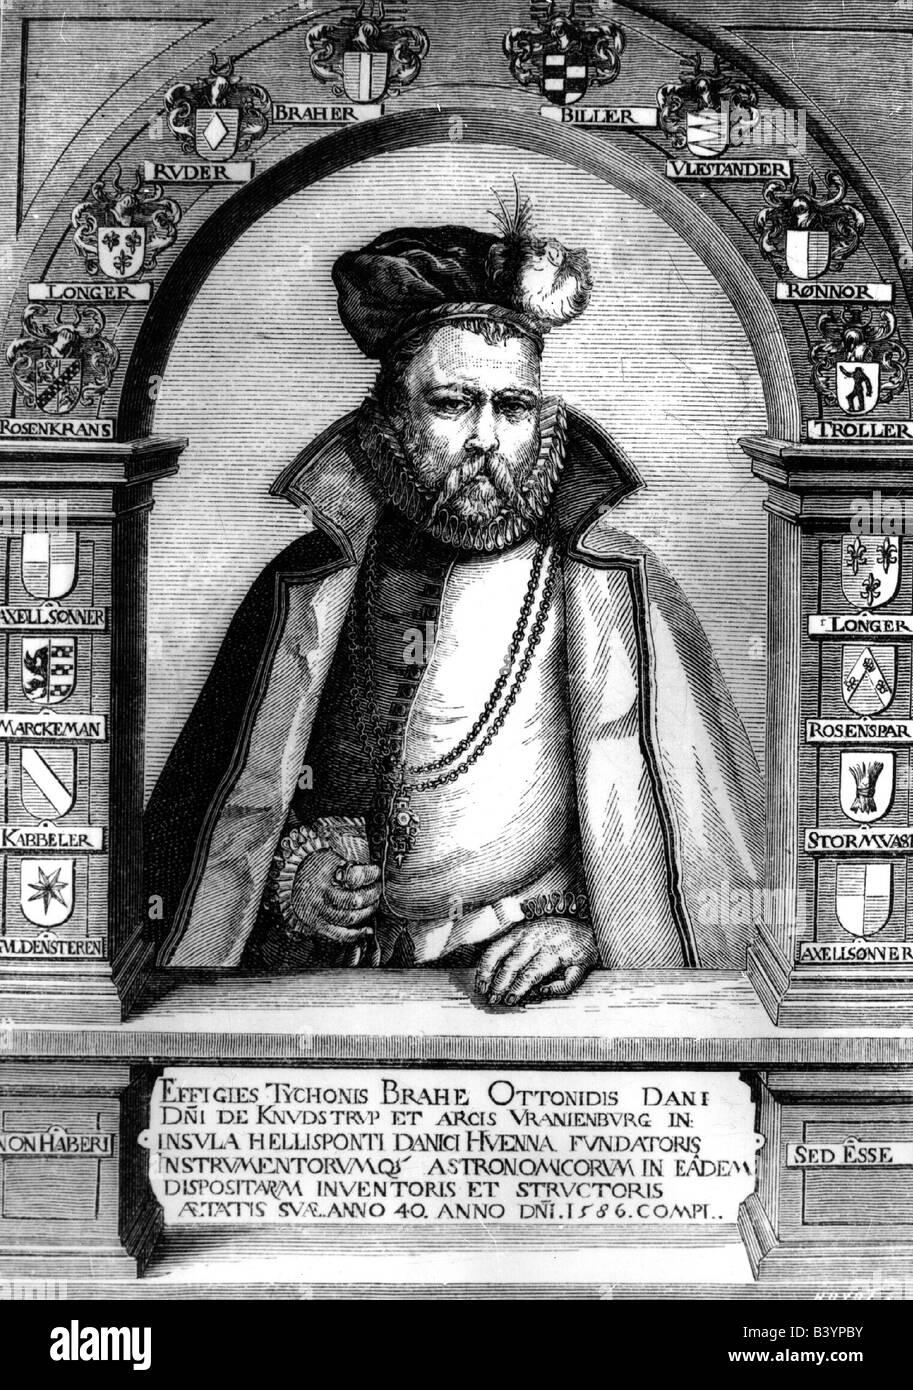 Brahe, Tycho, 14.12.1546 - 24.10.1601, Danish astronomer,   nobleman, half length circa 1586, coat of arms, engraving - Stock Image